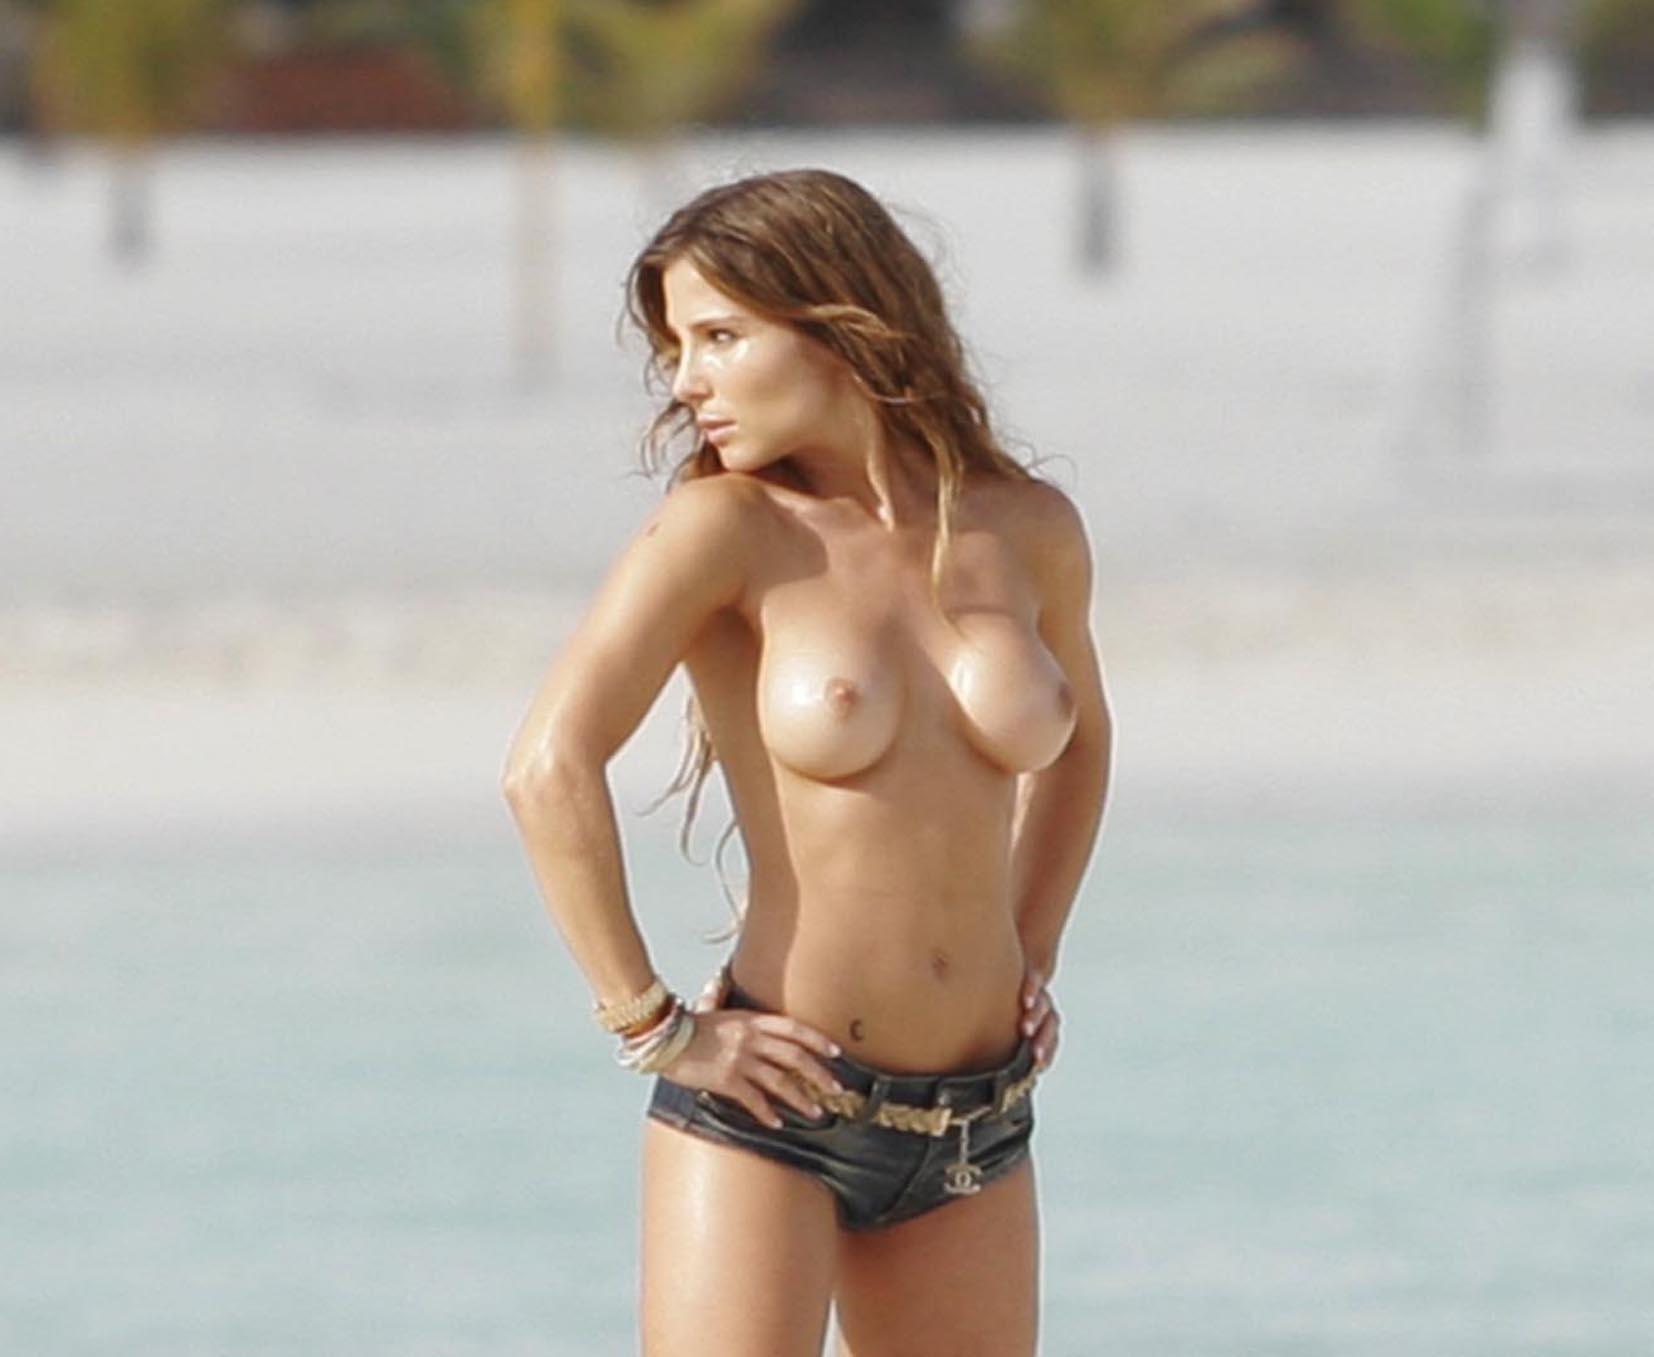 keira knightley naked ass